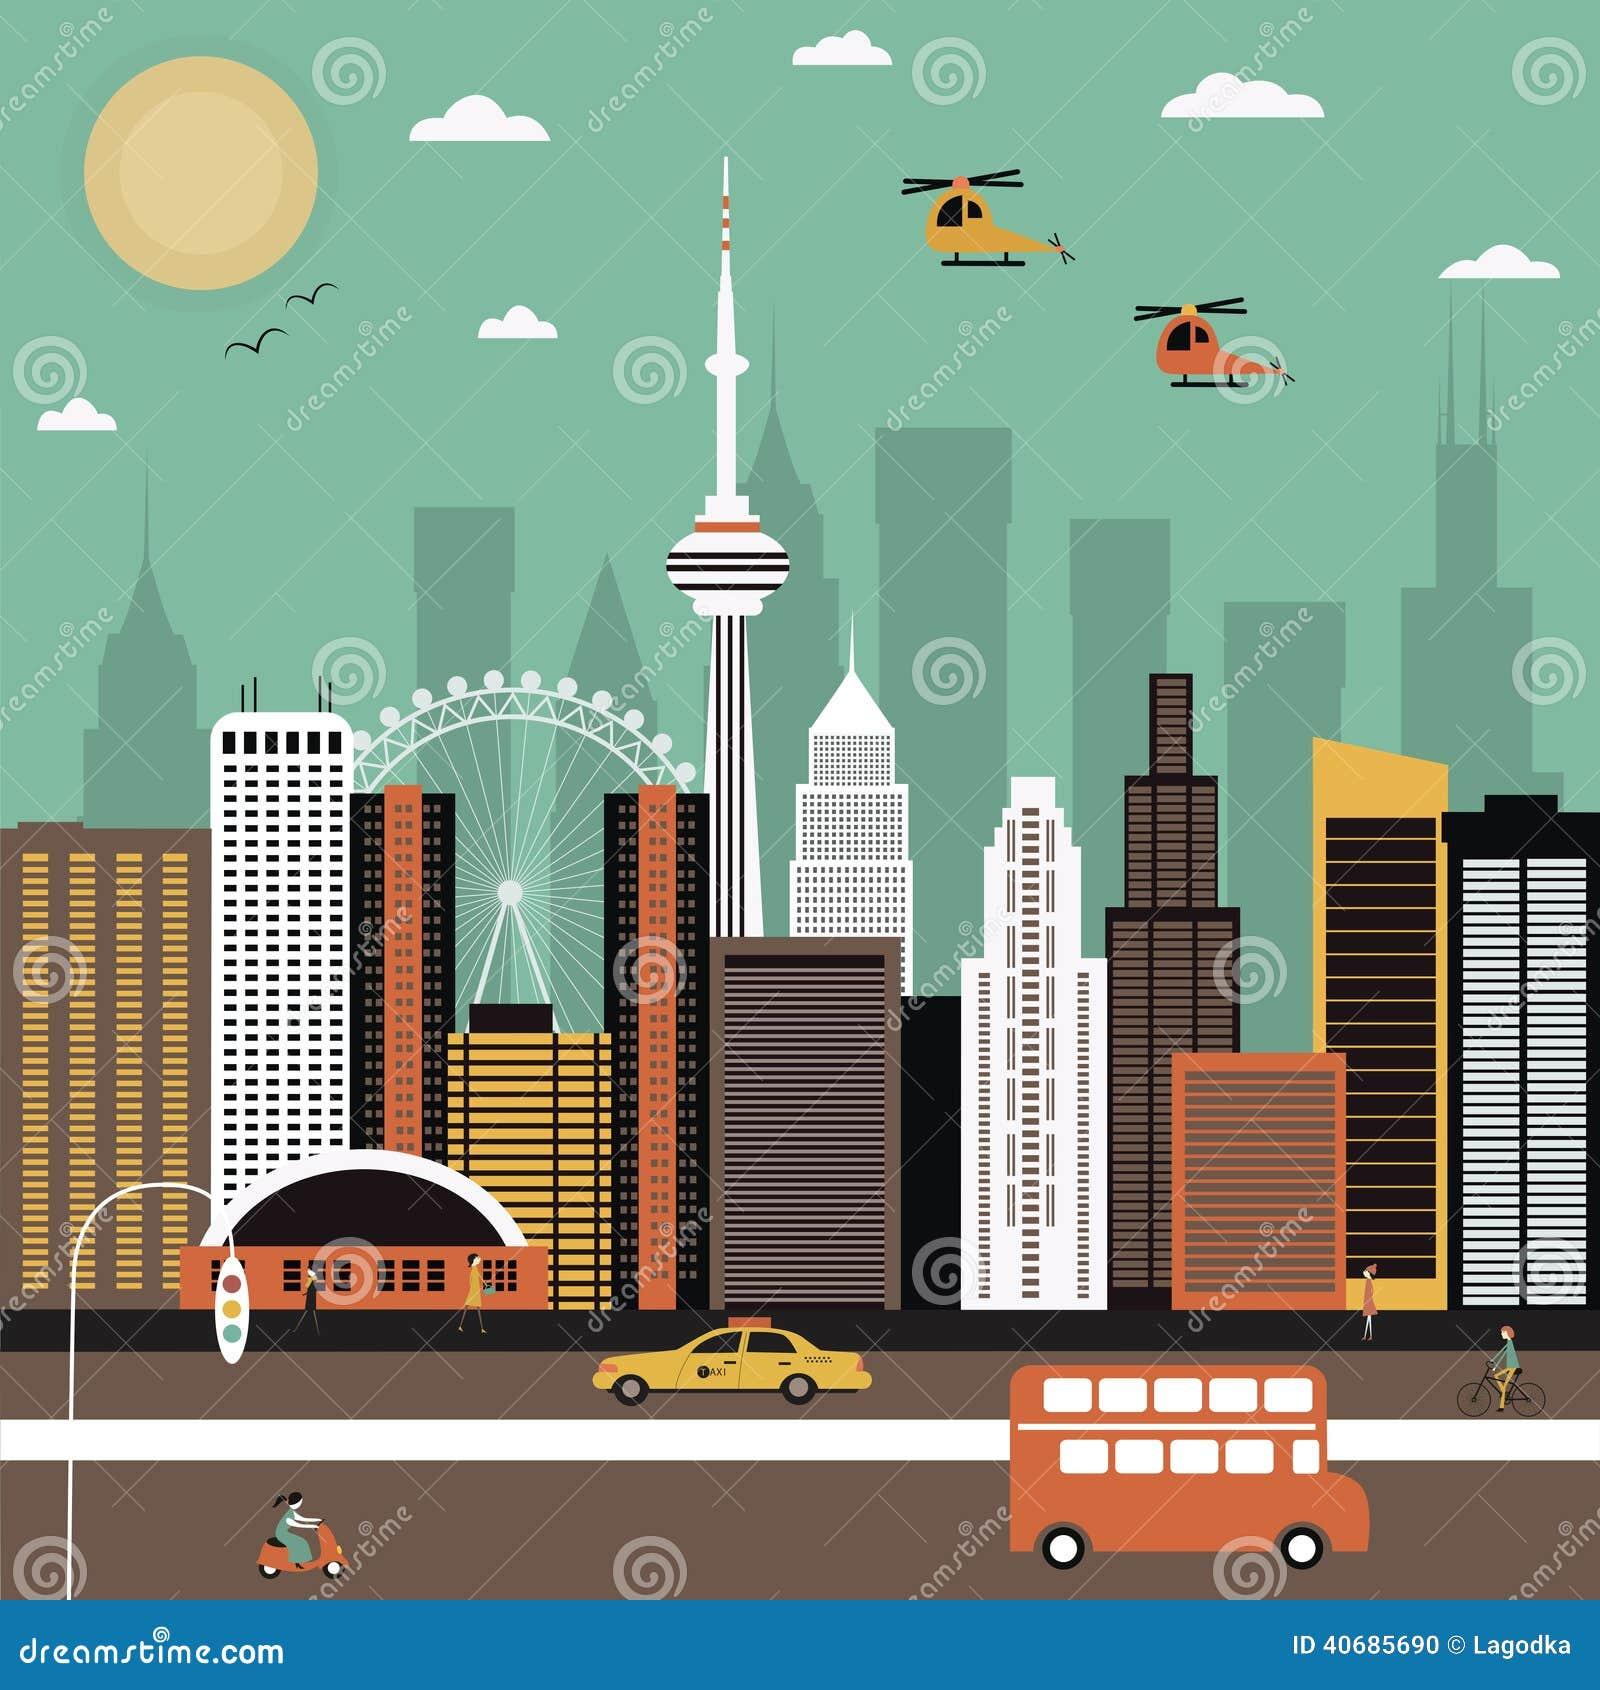 Delightful Free Modern House Plans Download #2: Modern-city-street-vector-illustration-40685690.jpg